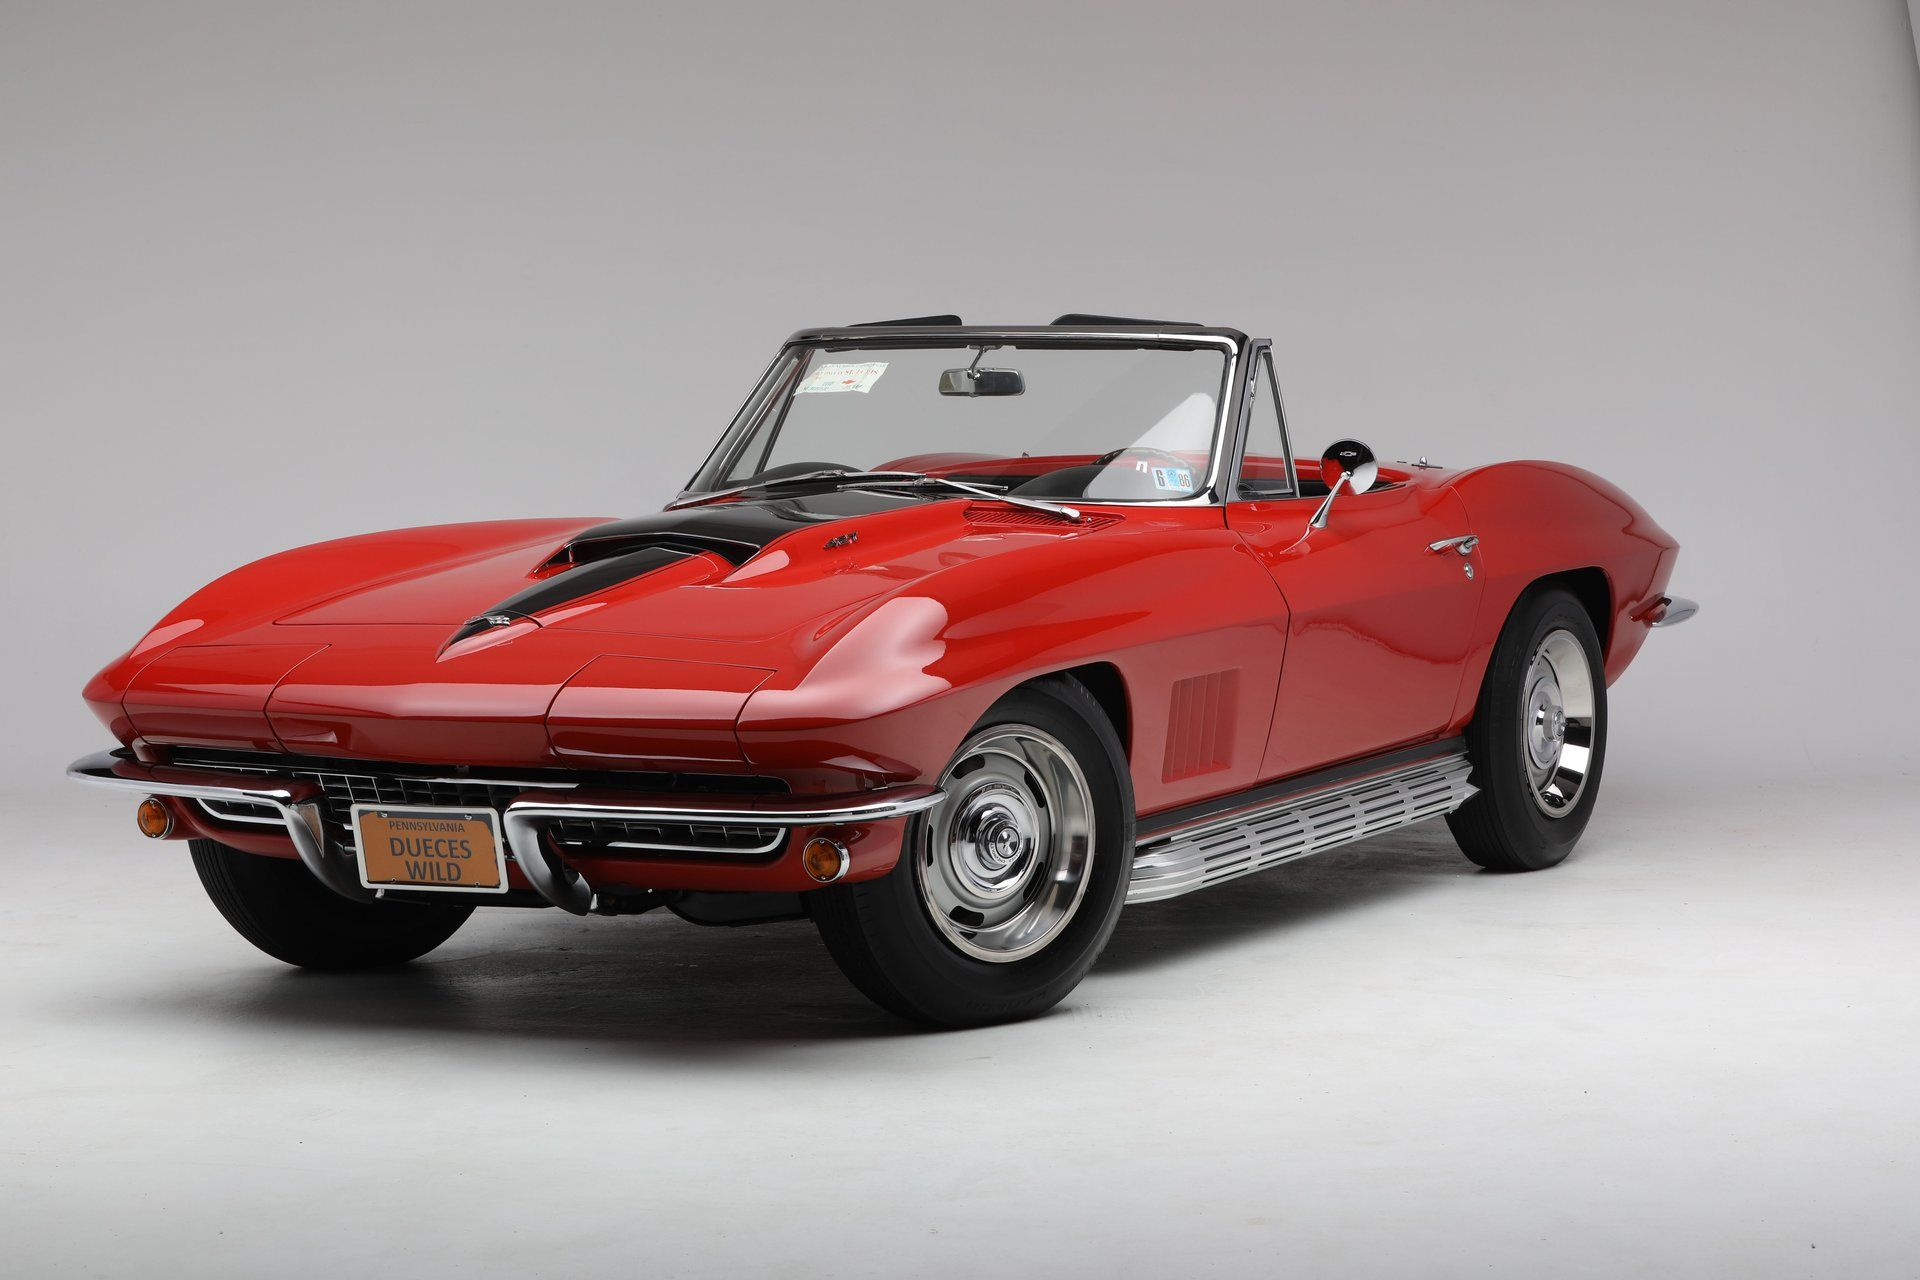 "<img src=""1967-chevrolet-corvette.jpeg"" alt=""An award-winning 1967 Chevrolet Corvette Convertible L71"">"